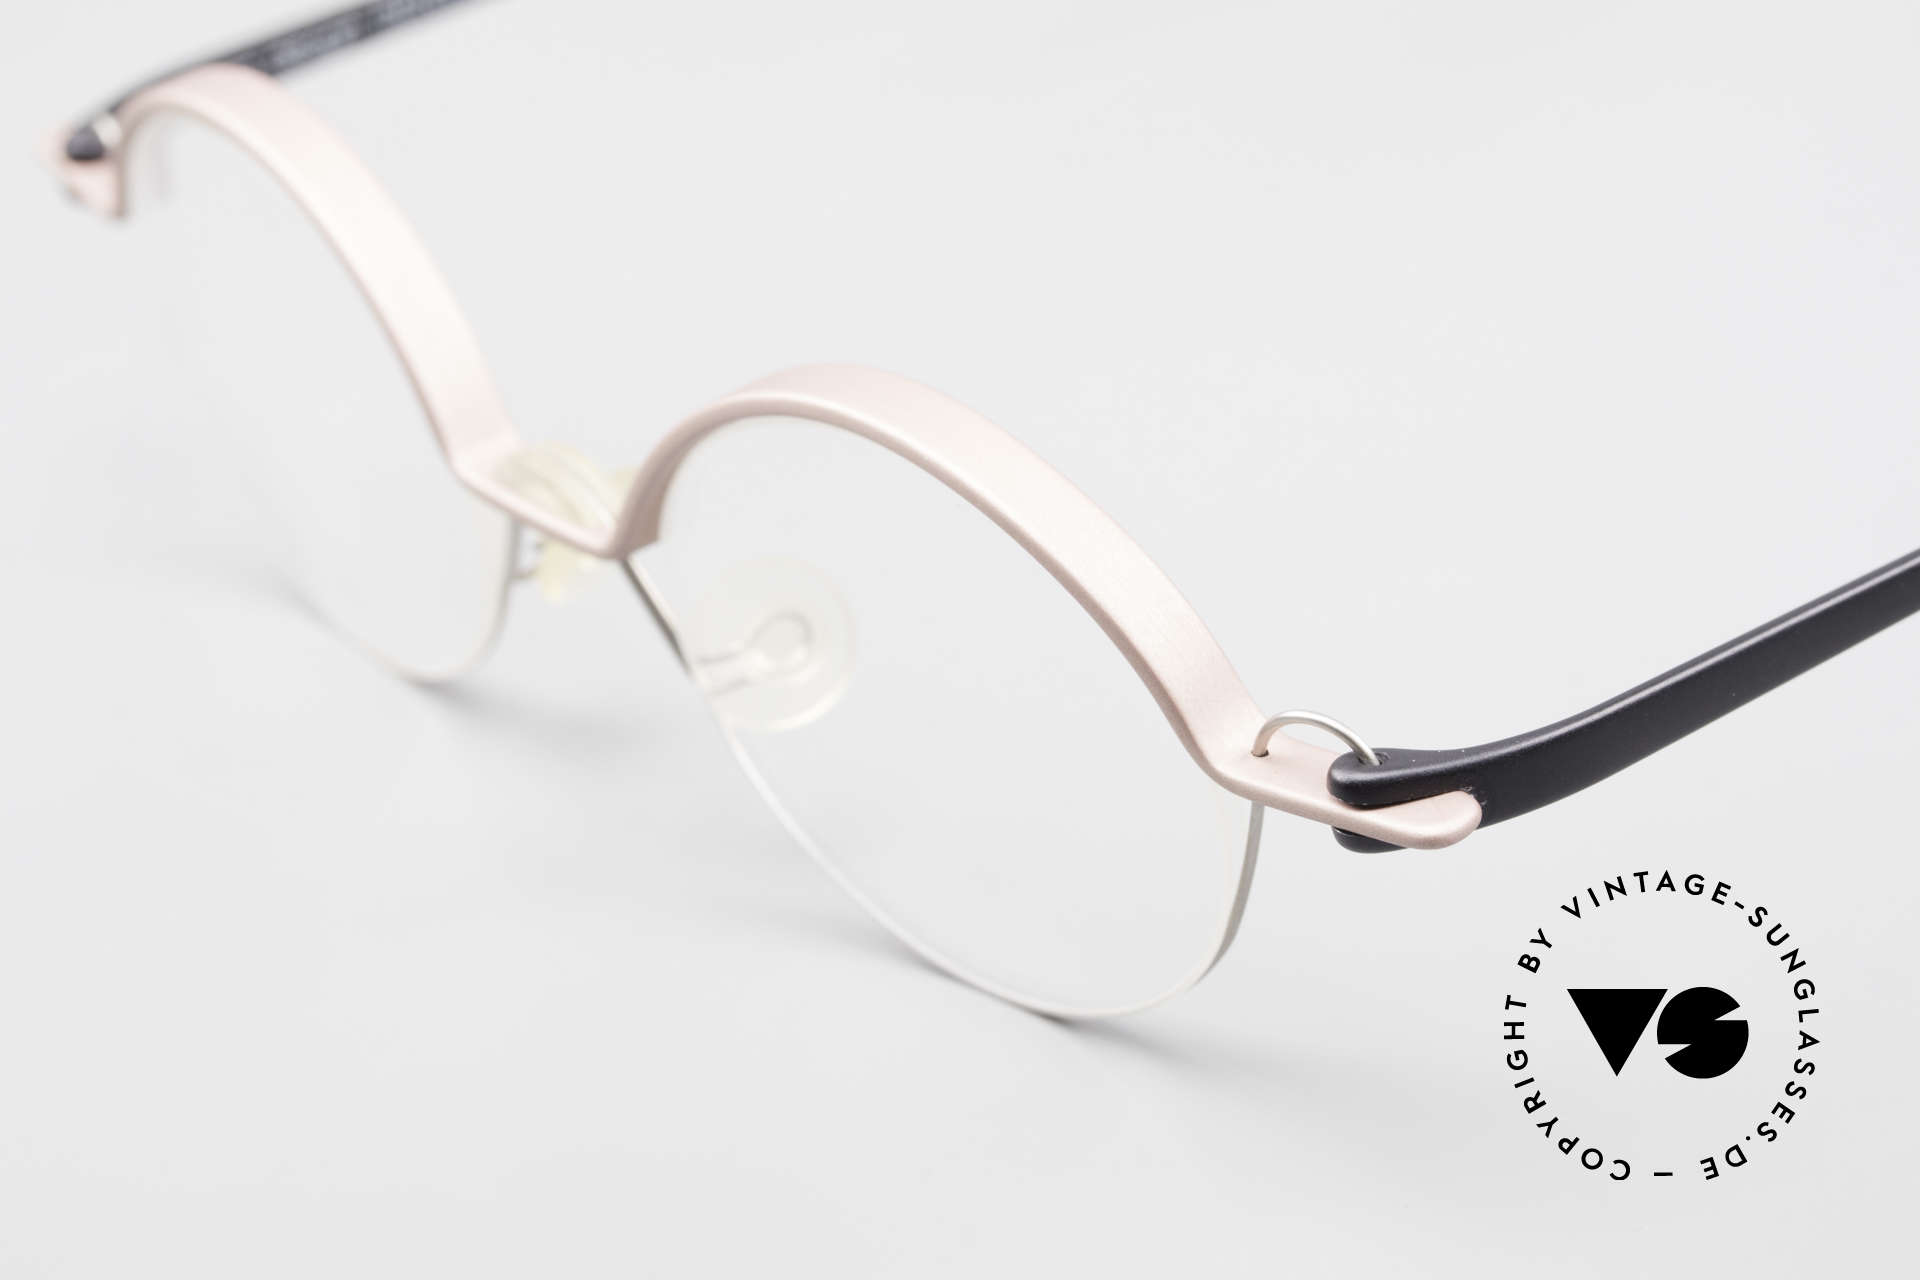 ProDesign No23 Gail Spence Design Frame 90's, distinctively GAIL SPENCE (specs for design lovers), Made for Men and Women